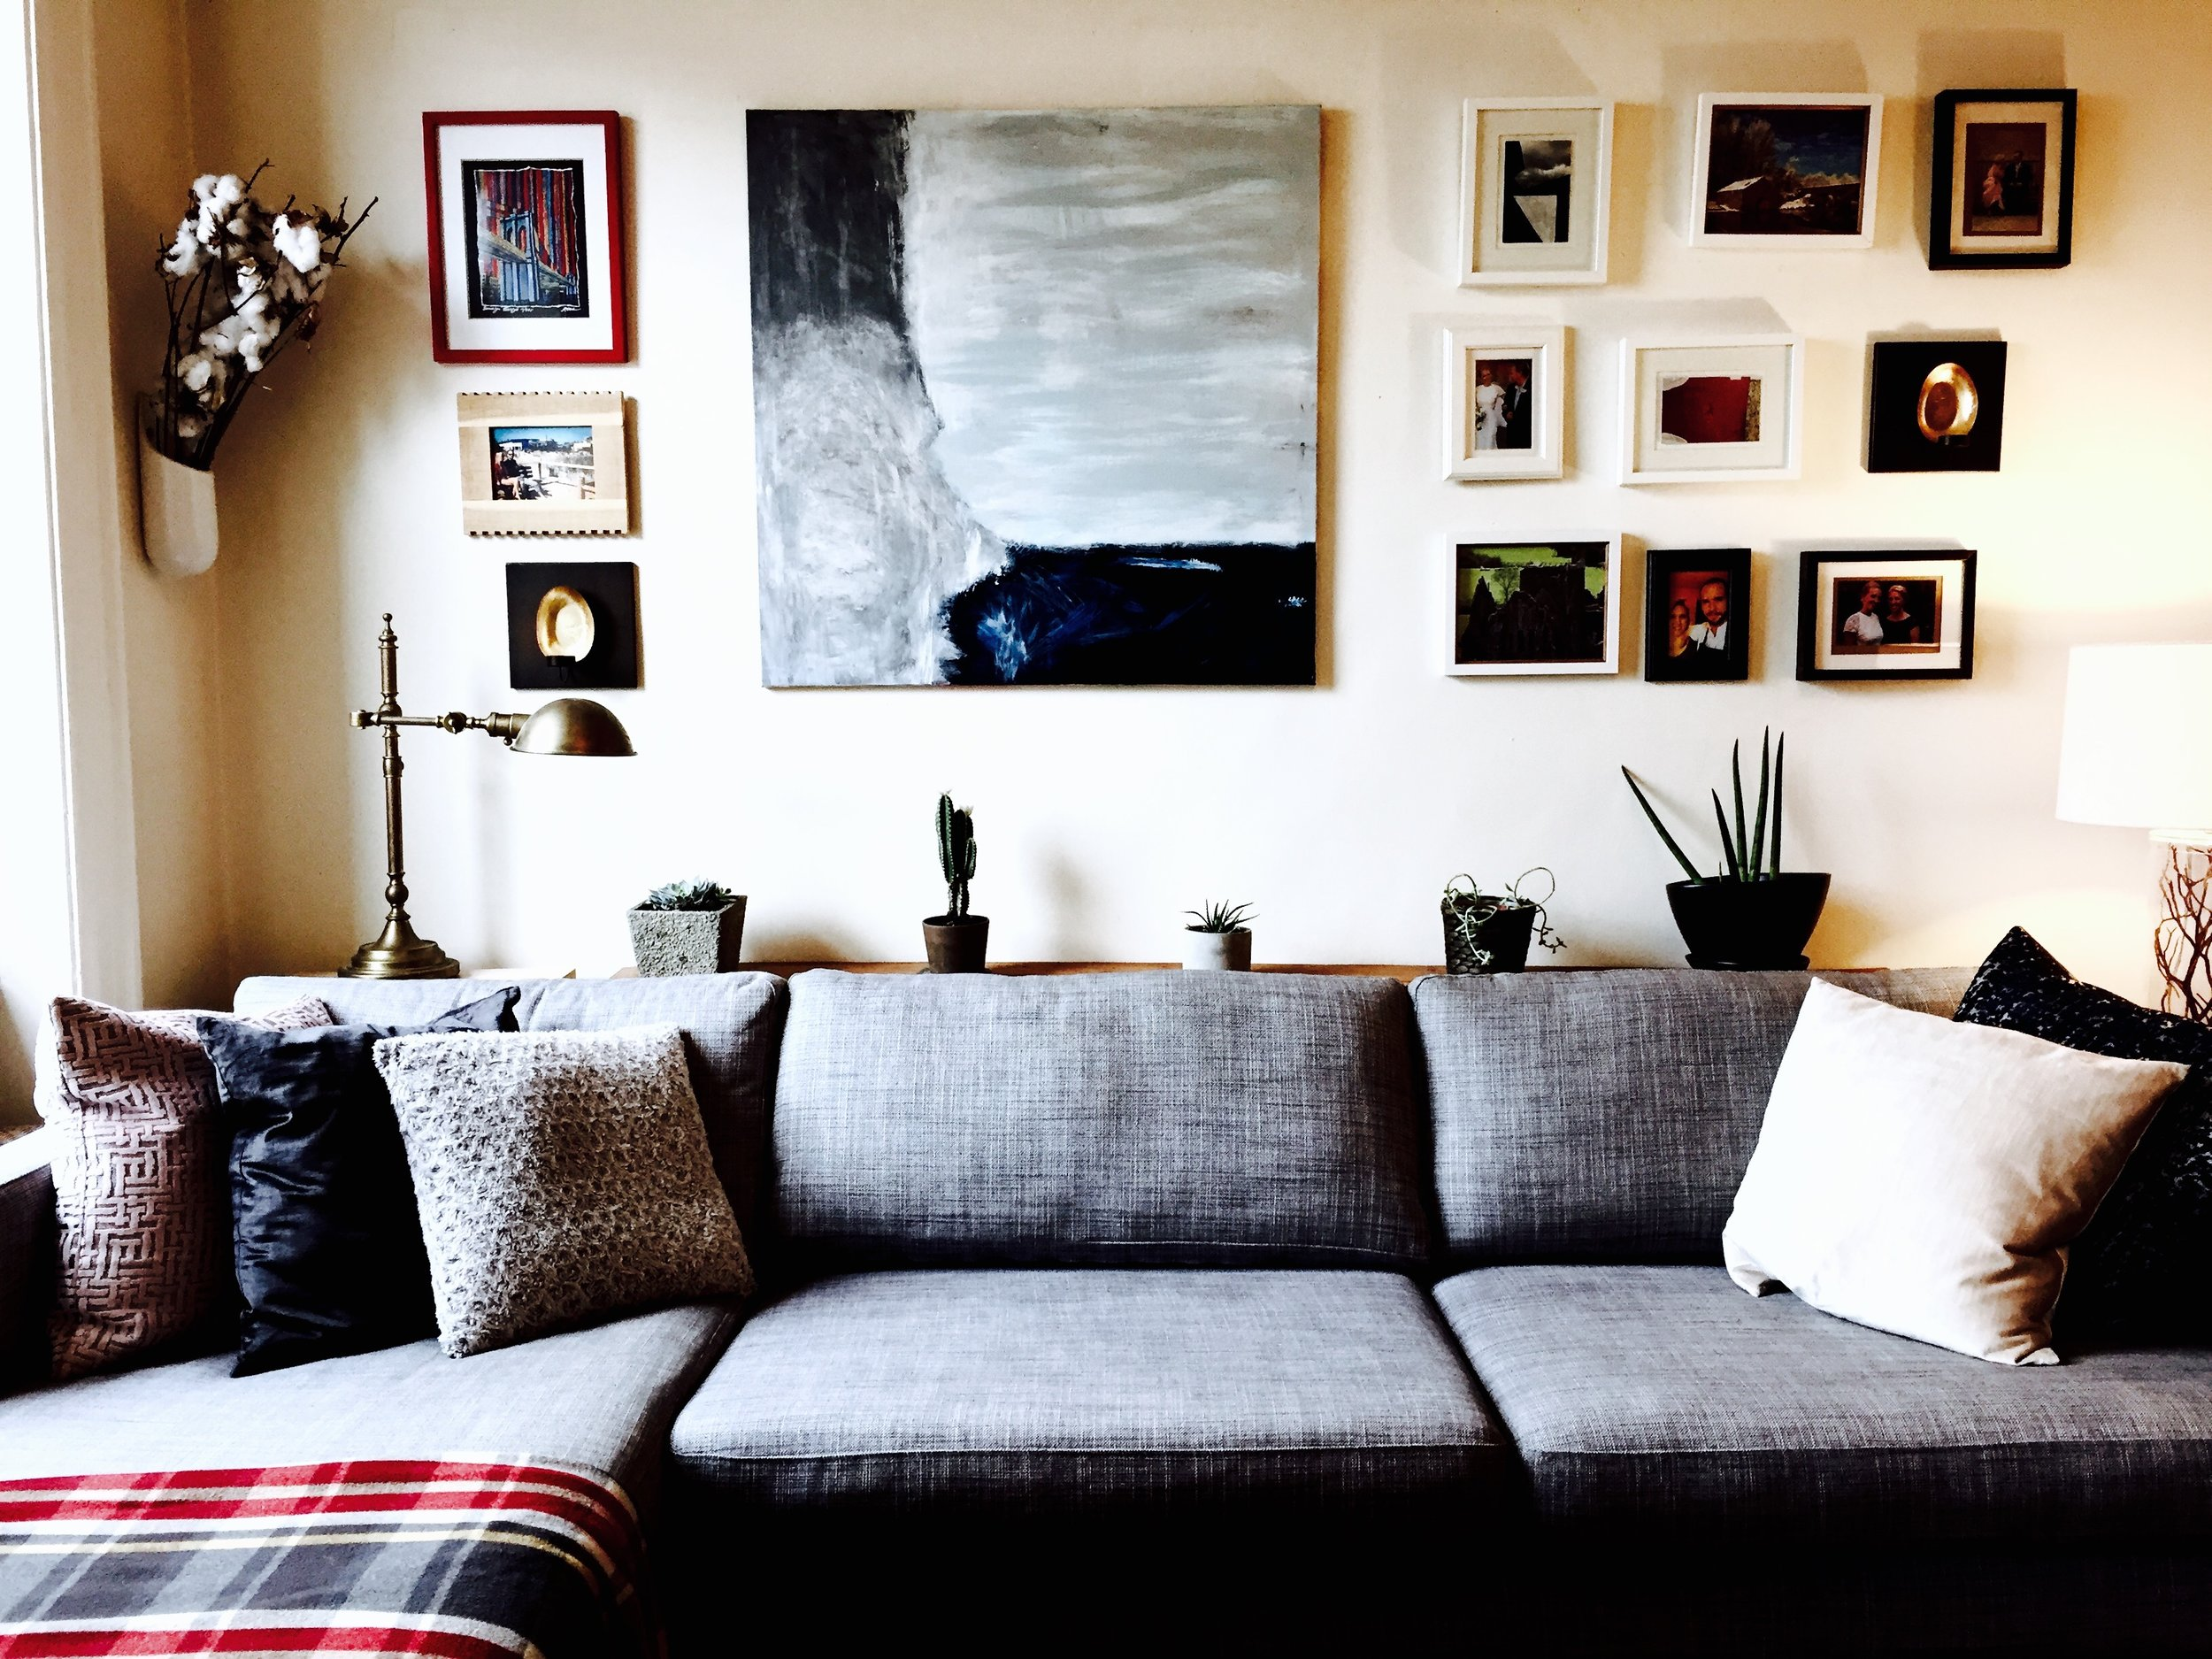 Home Gallery wall.jpg